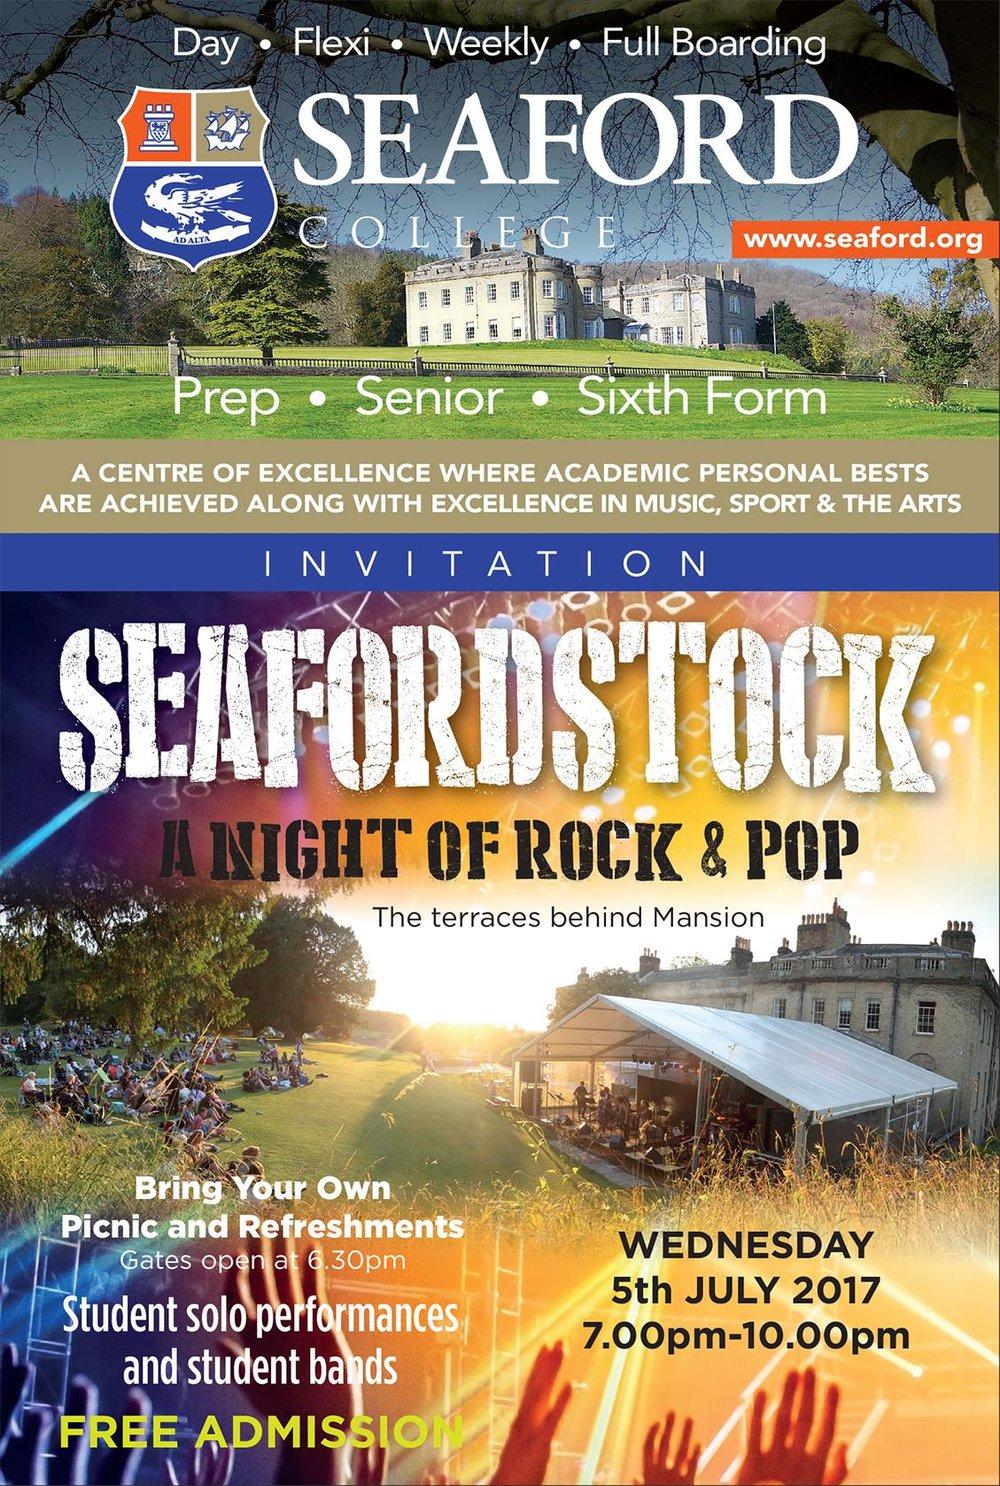 Seafordstock 2017